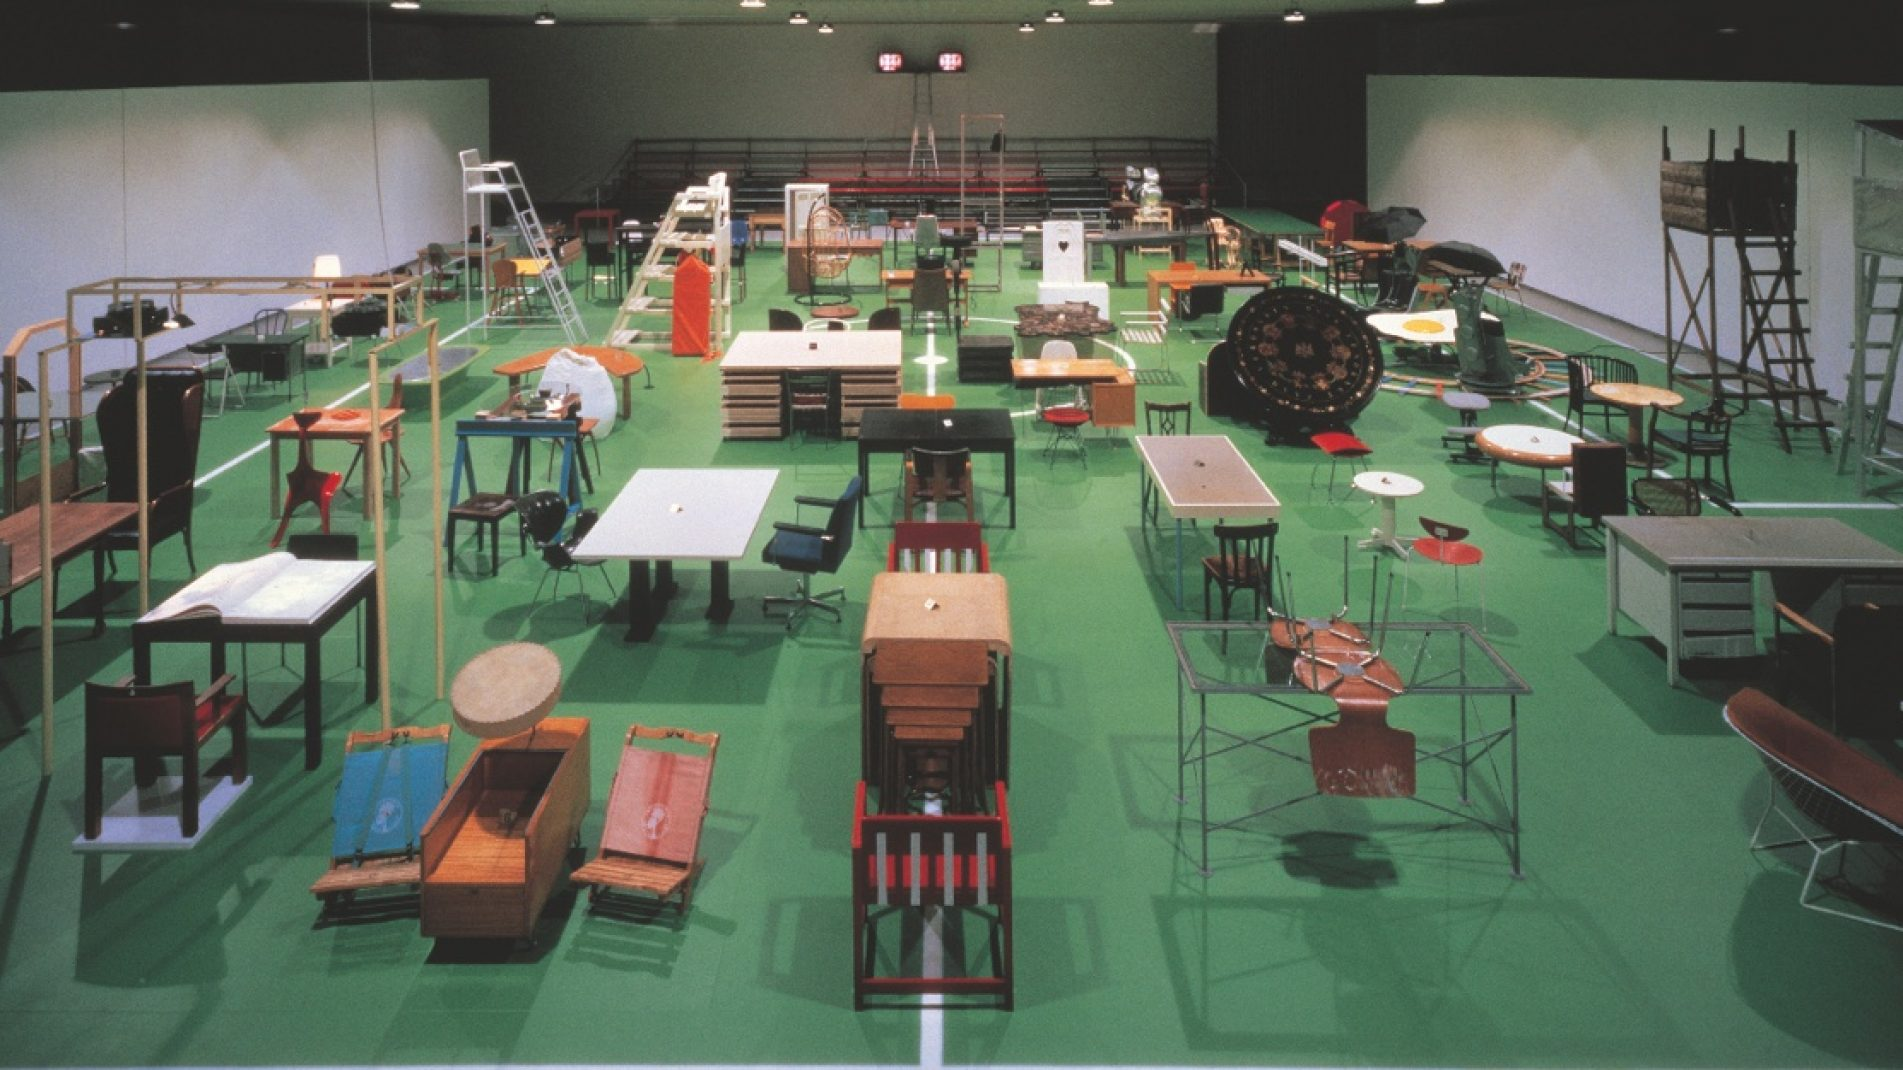 Museum Boijmans Van Beuningen, Rotterdam. Photo Jannes Linders Fondazione